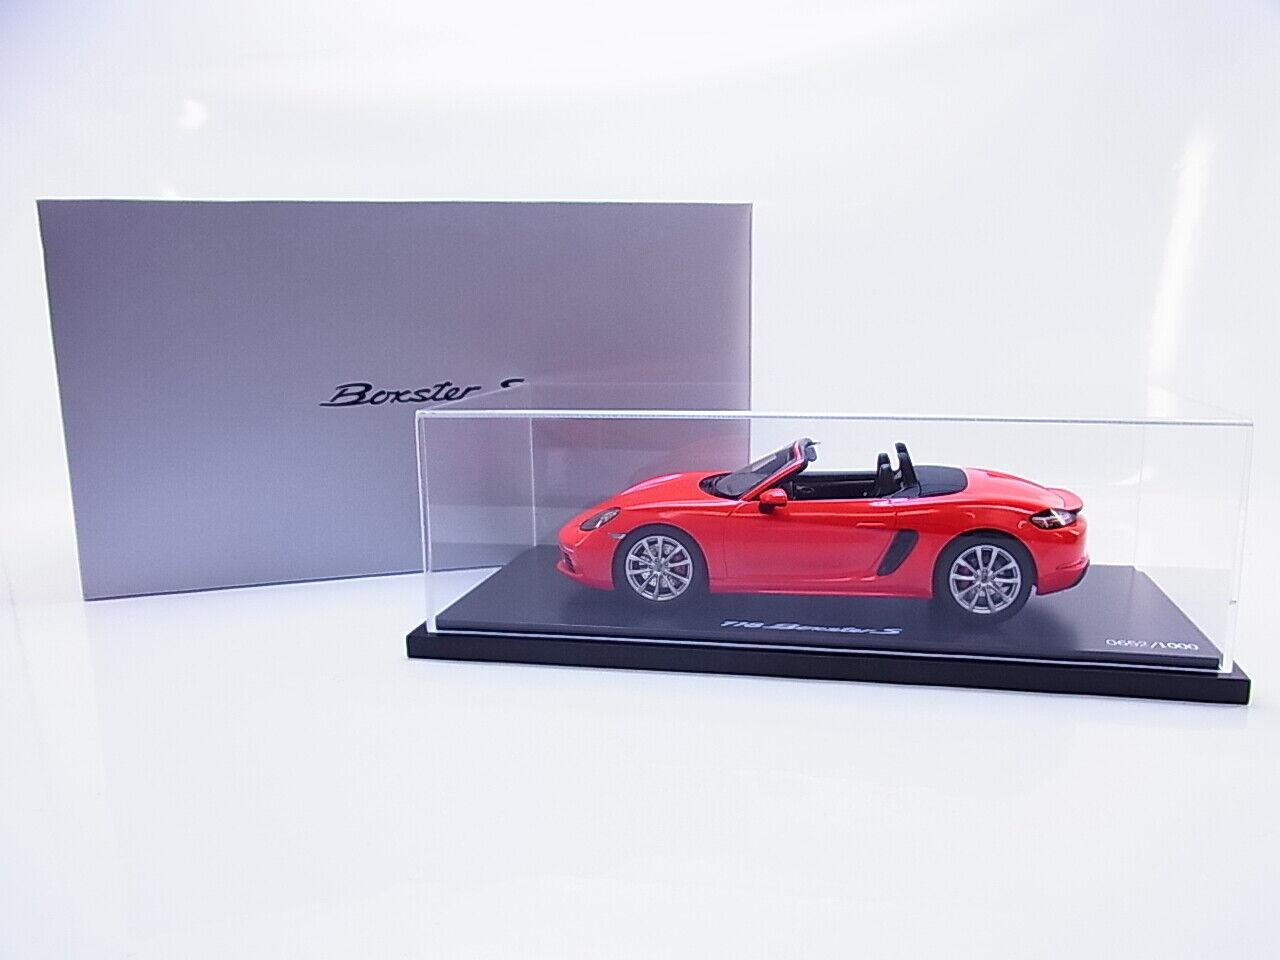 55022 Spark Porsche 718 Boxster S Type 982 onwards 2016 Lava orange 1 18 Cabinet OVP